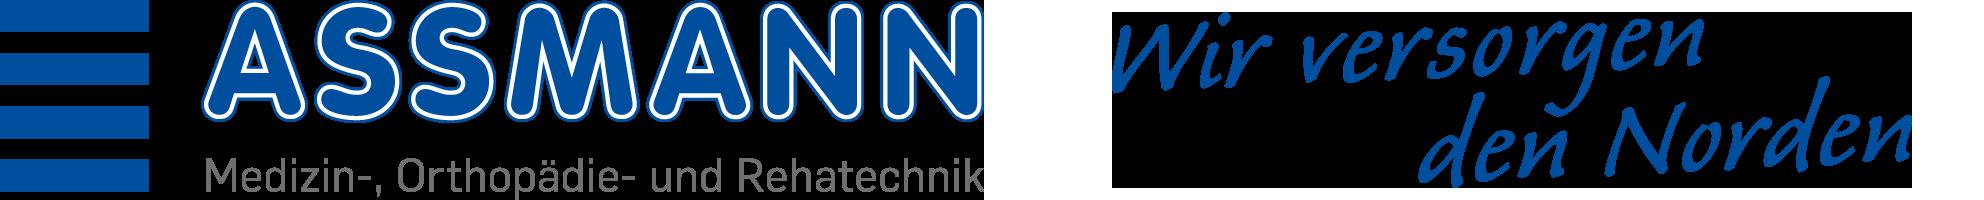 assmann-logo_plus-claim